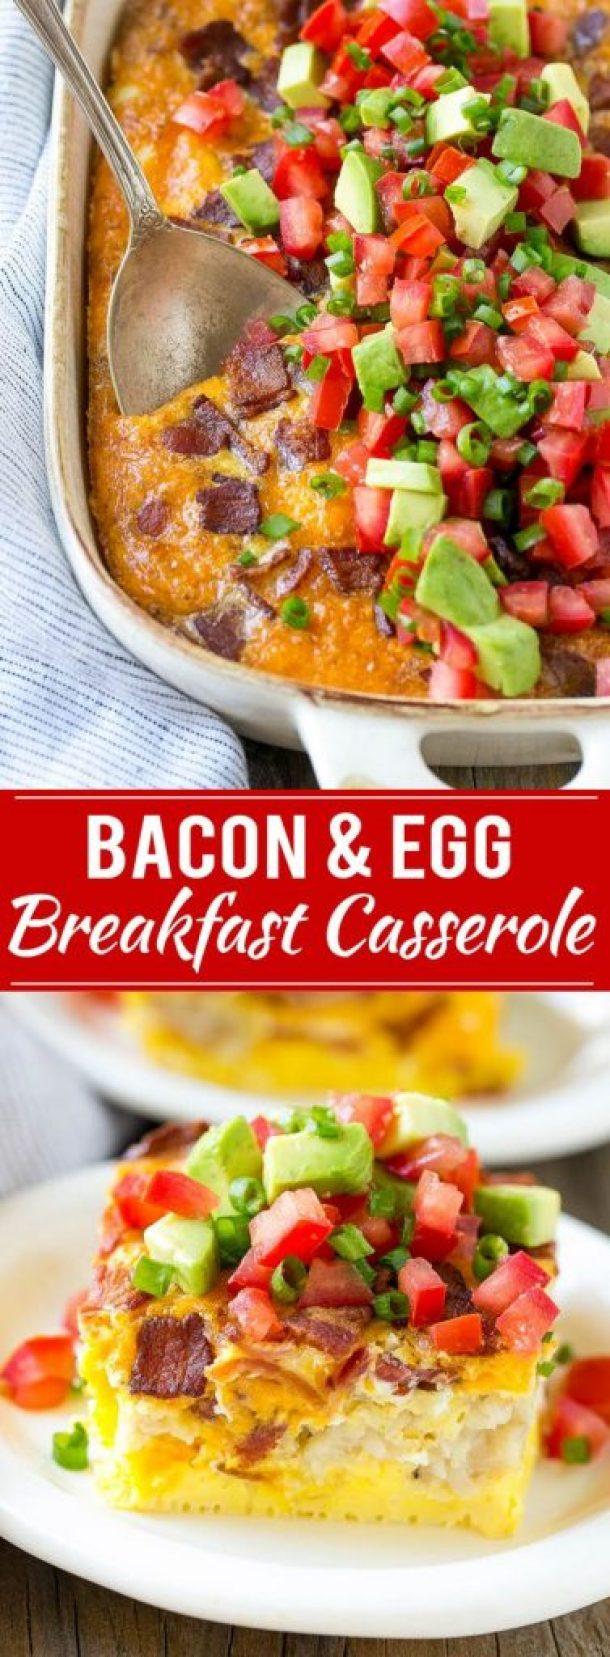 Bacon & Egg Breakfast Casserole Recipe | Dinner at the Zoo